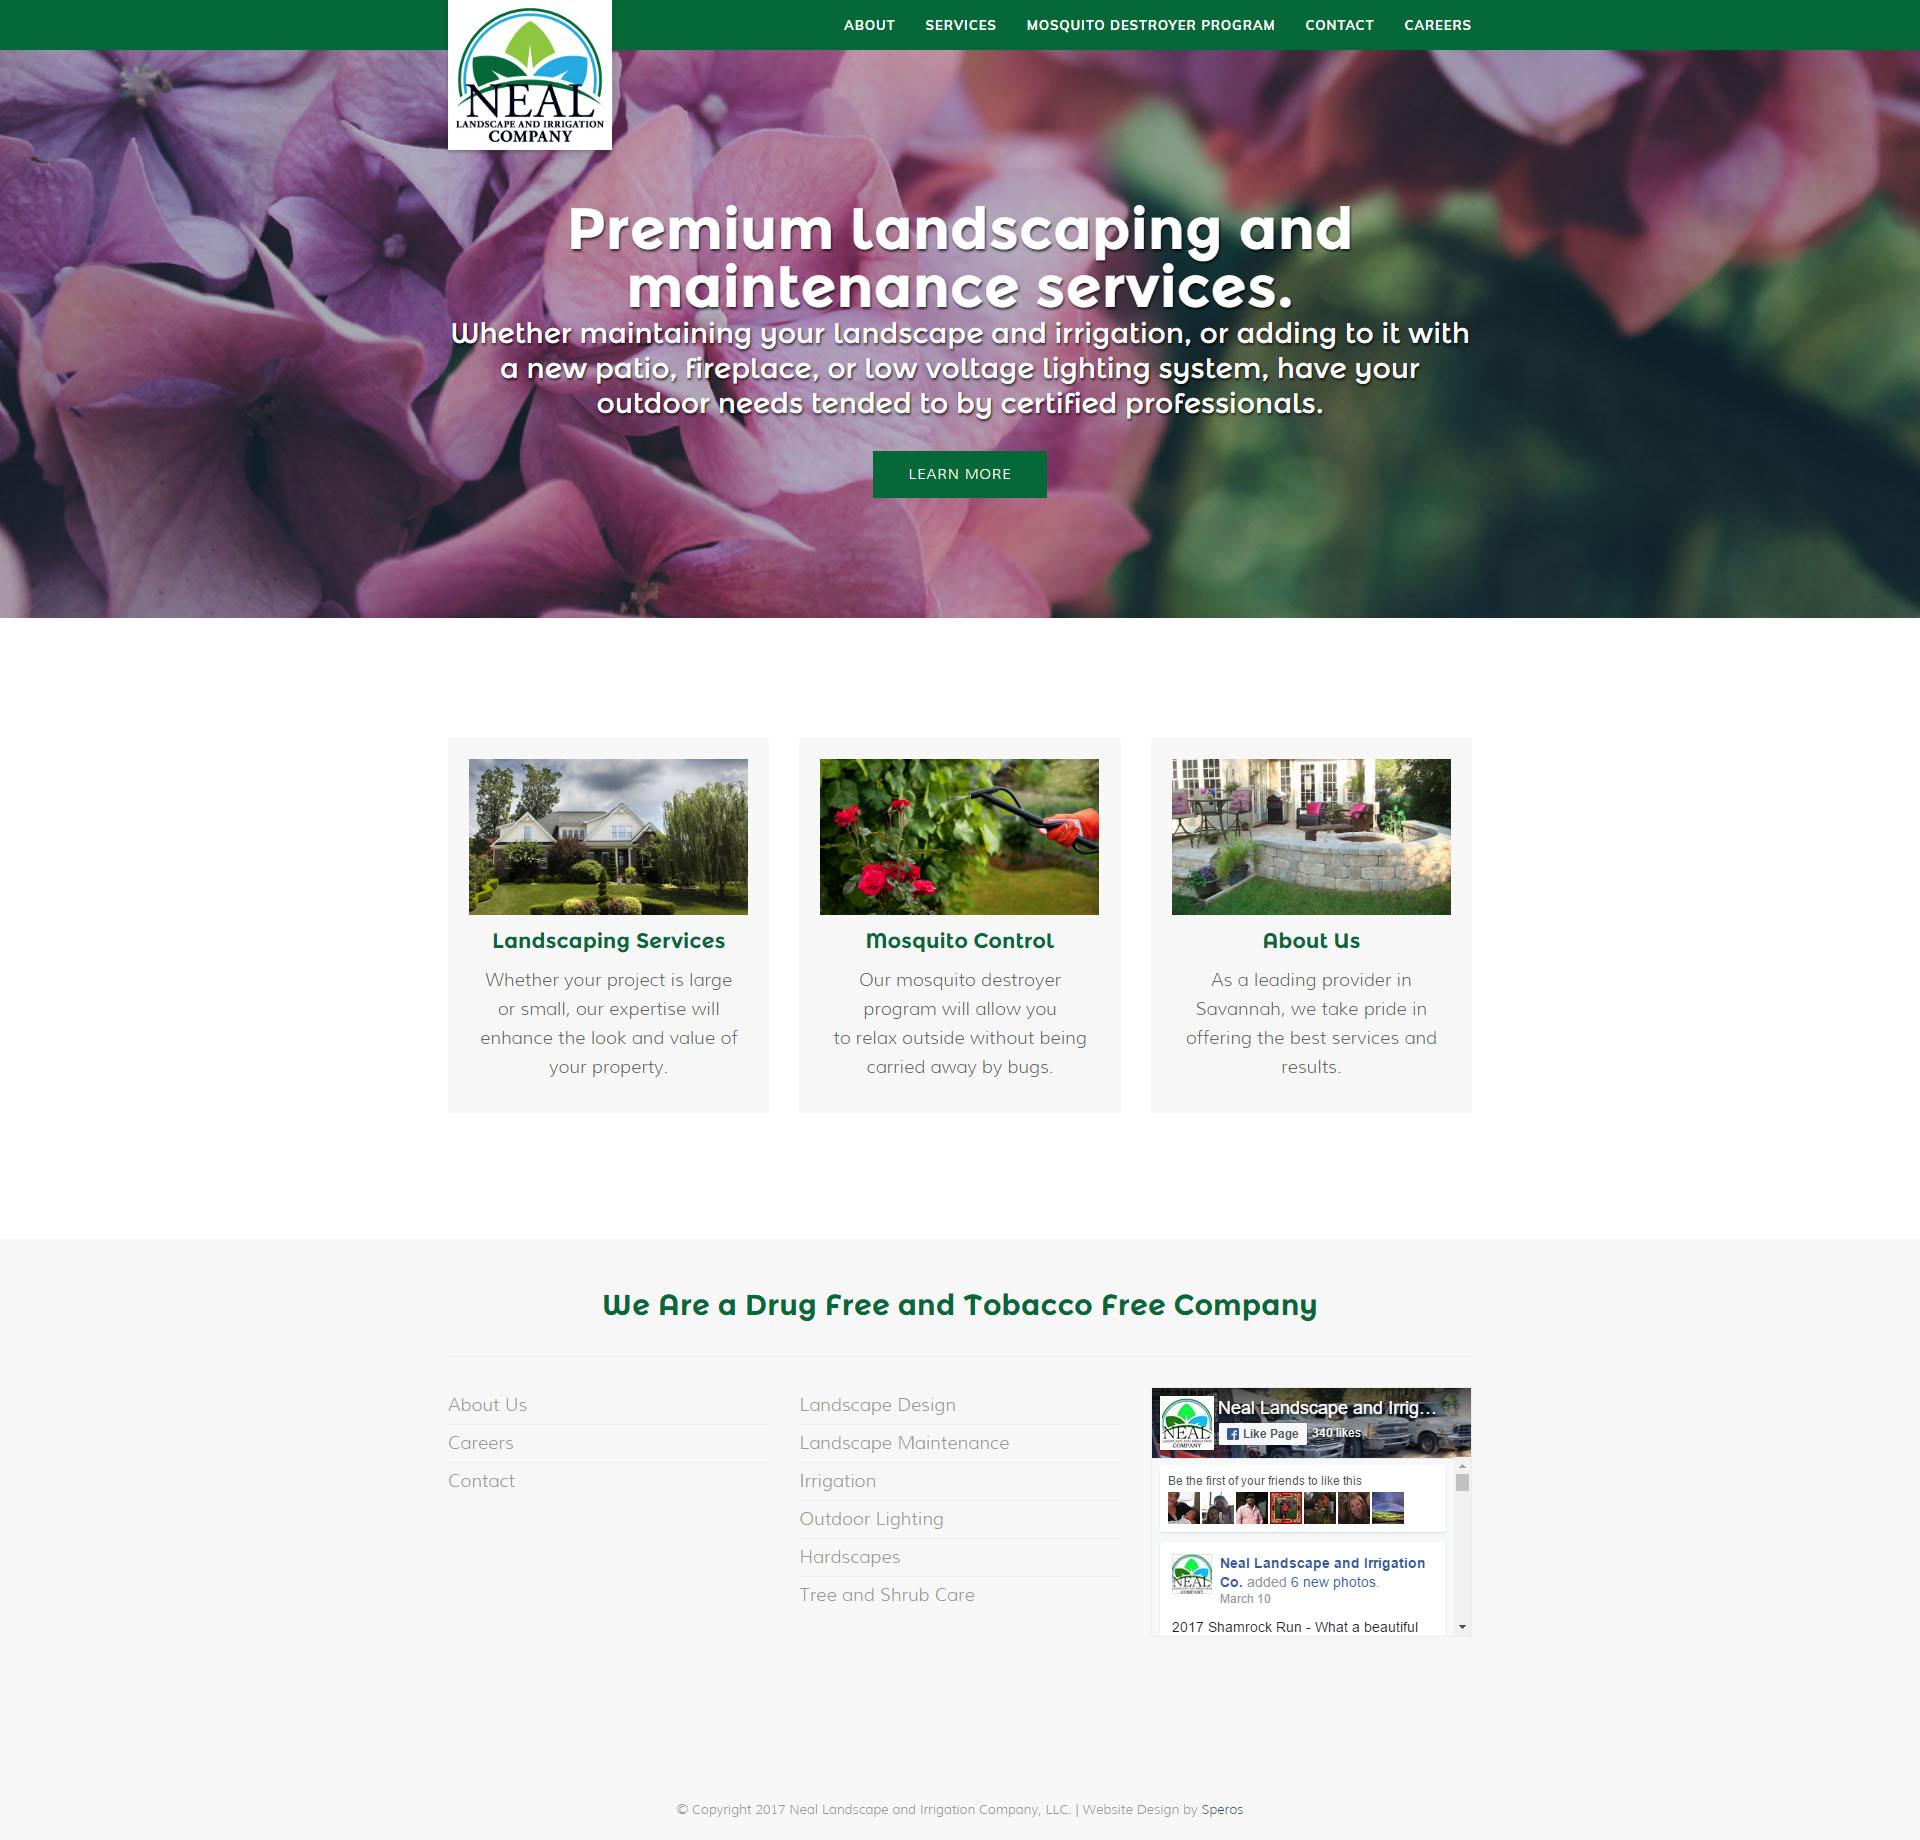 Neal Landscape and Irrigation Website